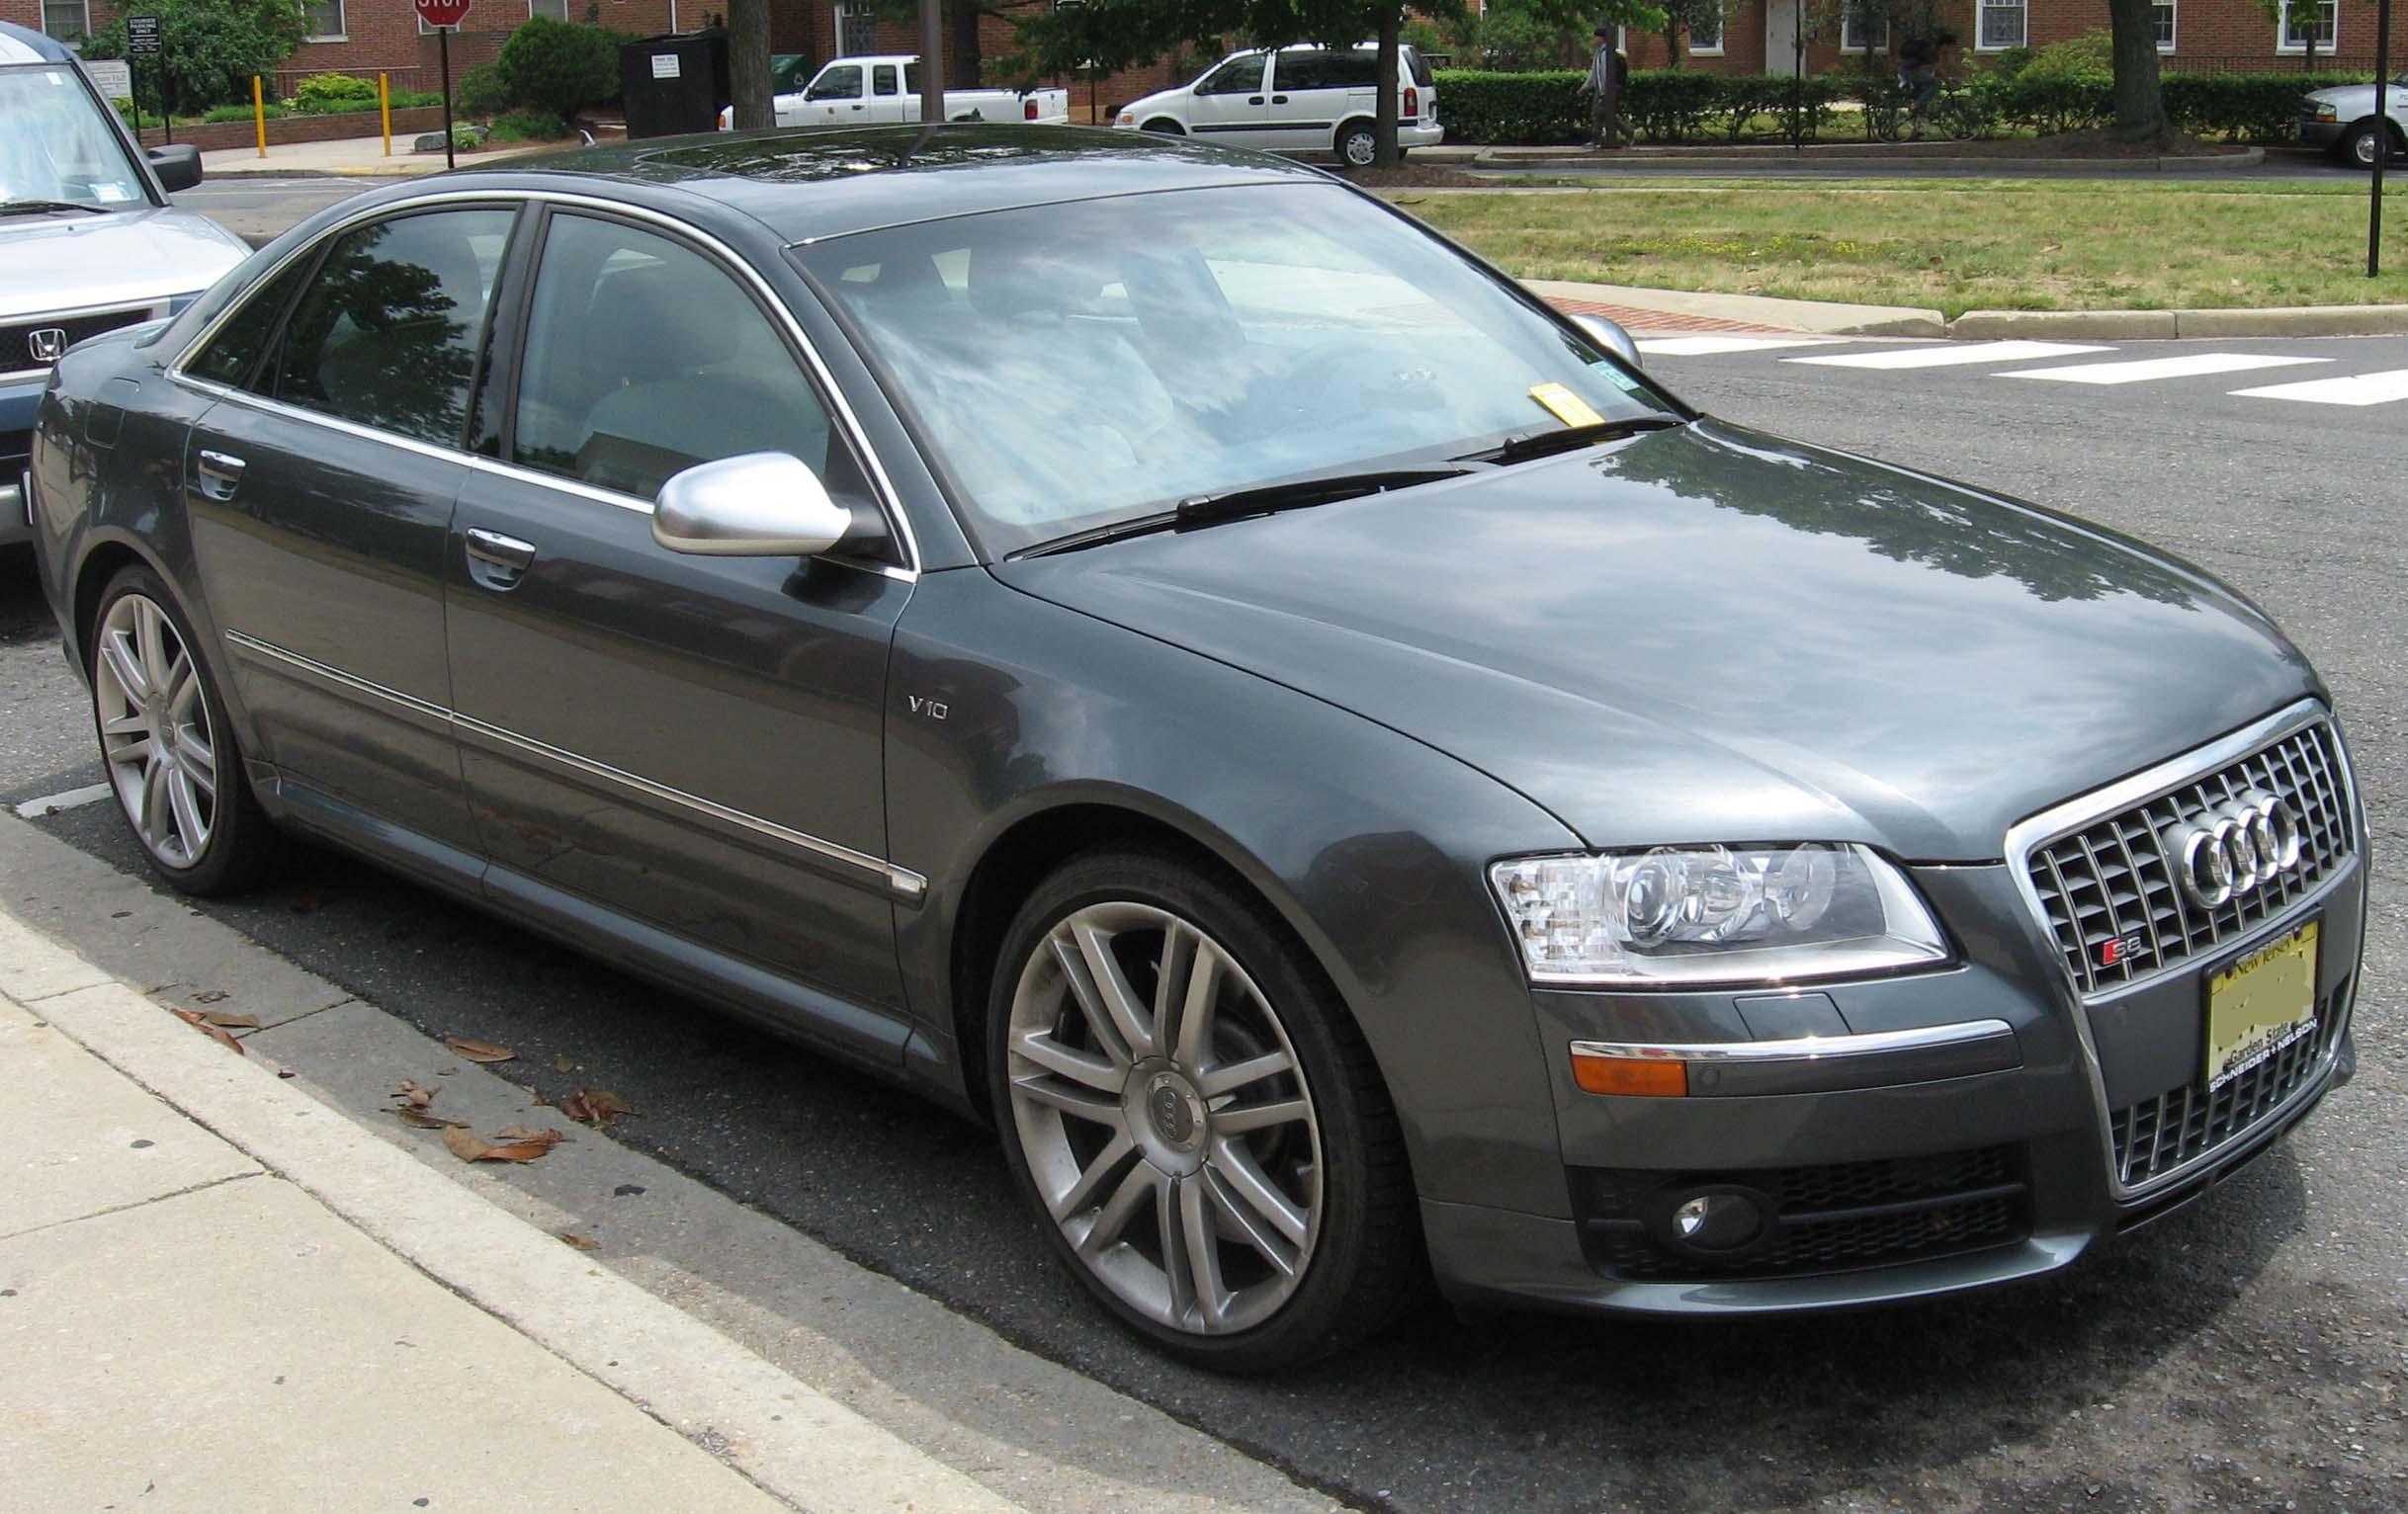 Fil:2007-Audi-S8.jpg - Wikipedia, den frie encyklopædi